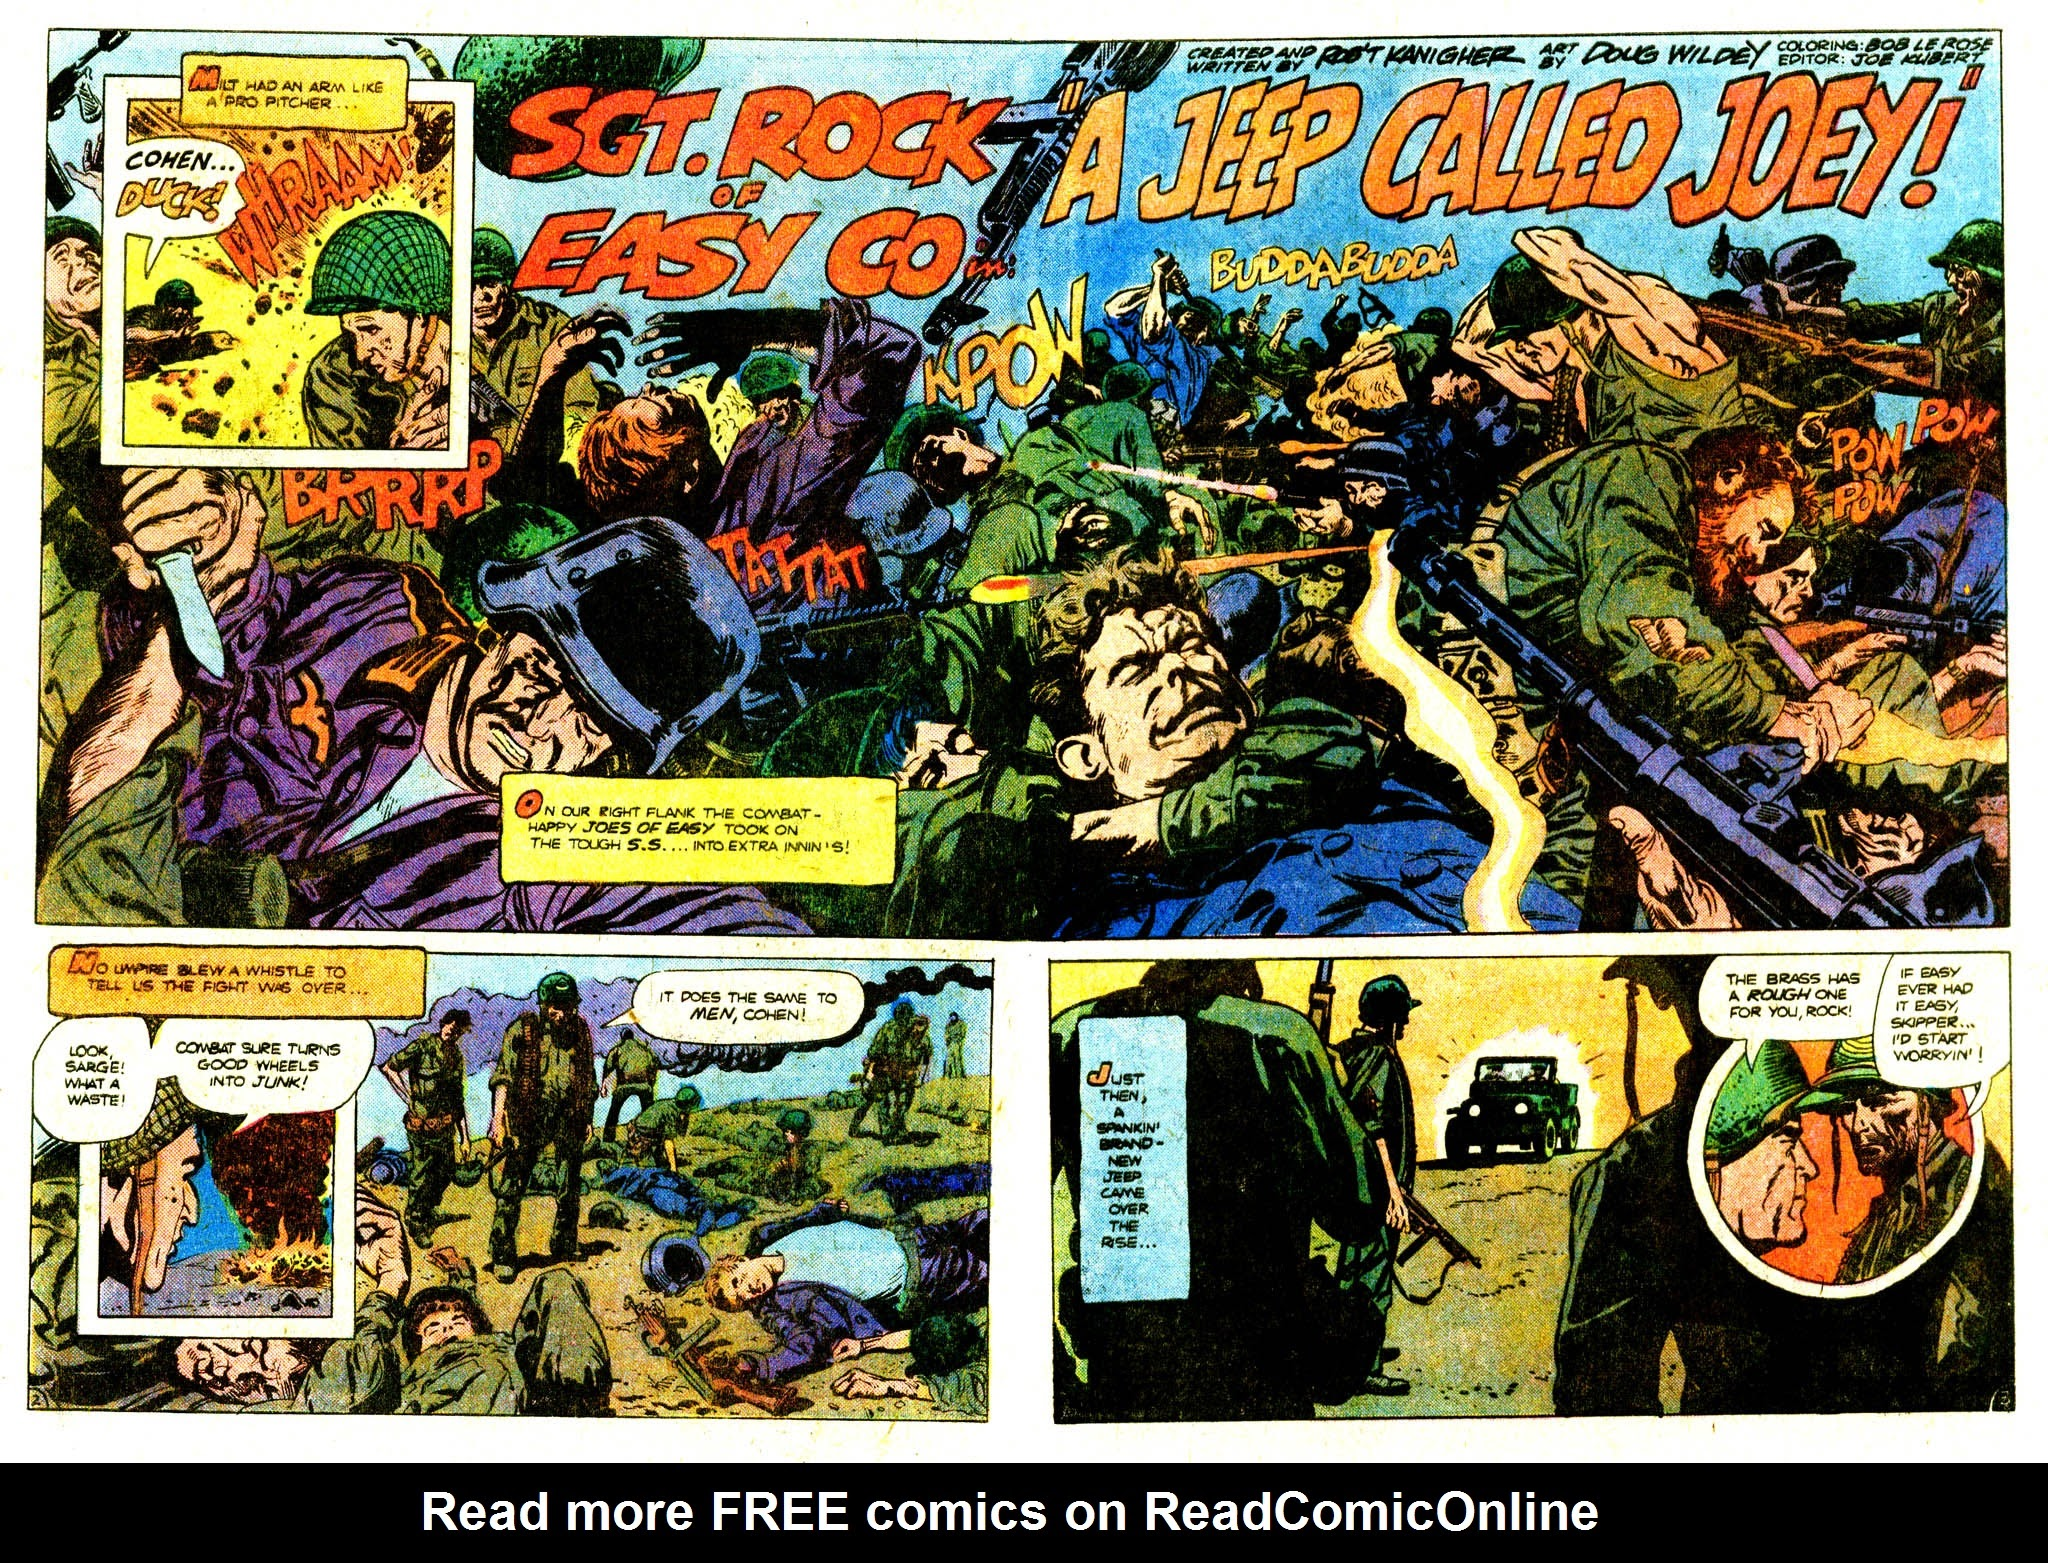 Read online Sgt. Rock comic -  Issue #313 - 4